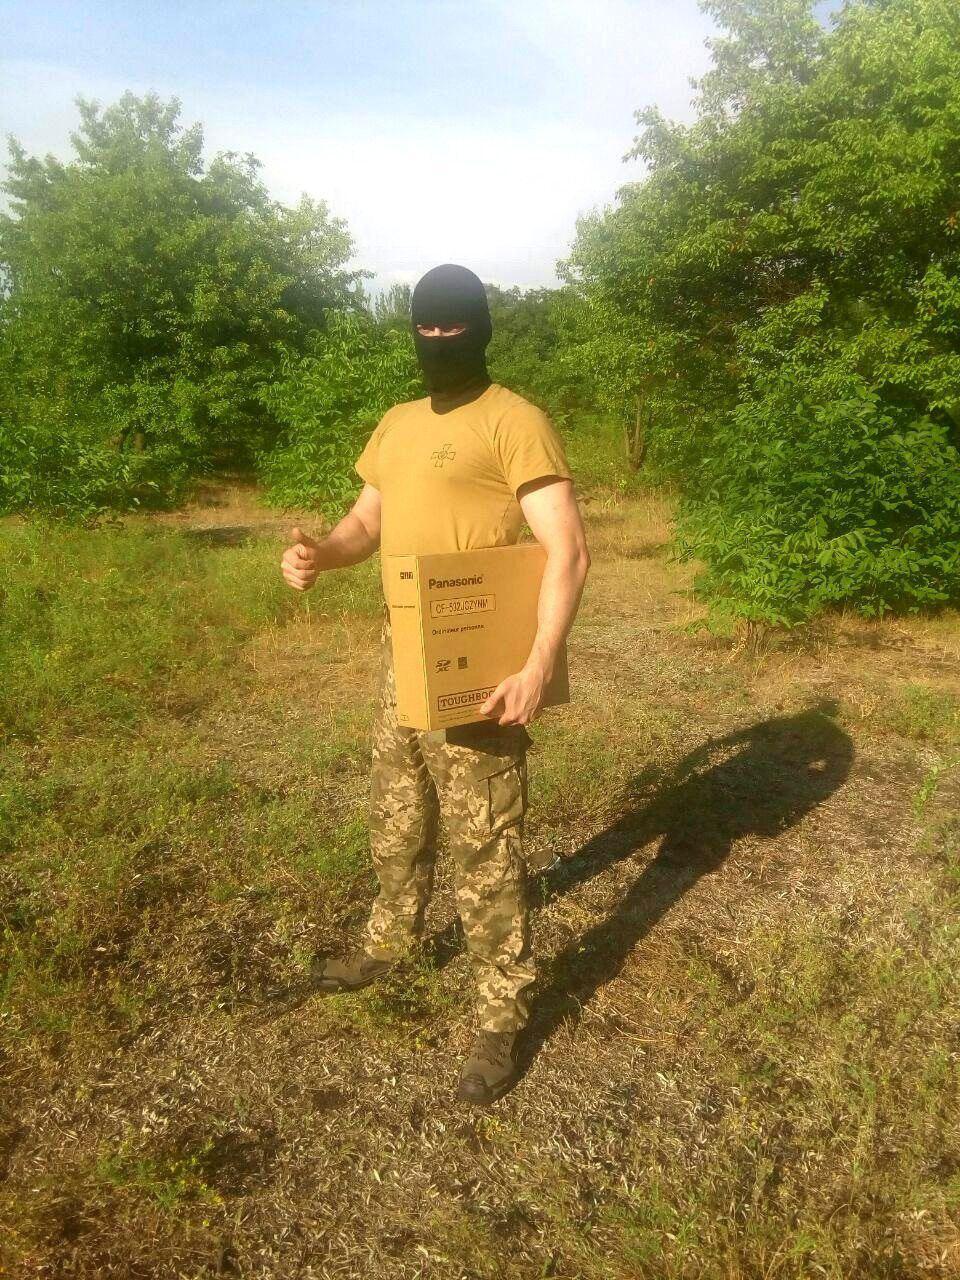 4-я танковая бригада в зоне ООС поменяет 17-ю ОТБр